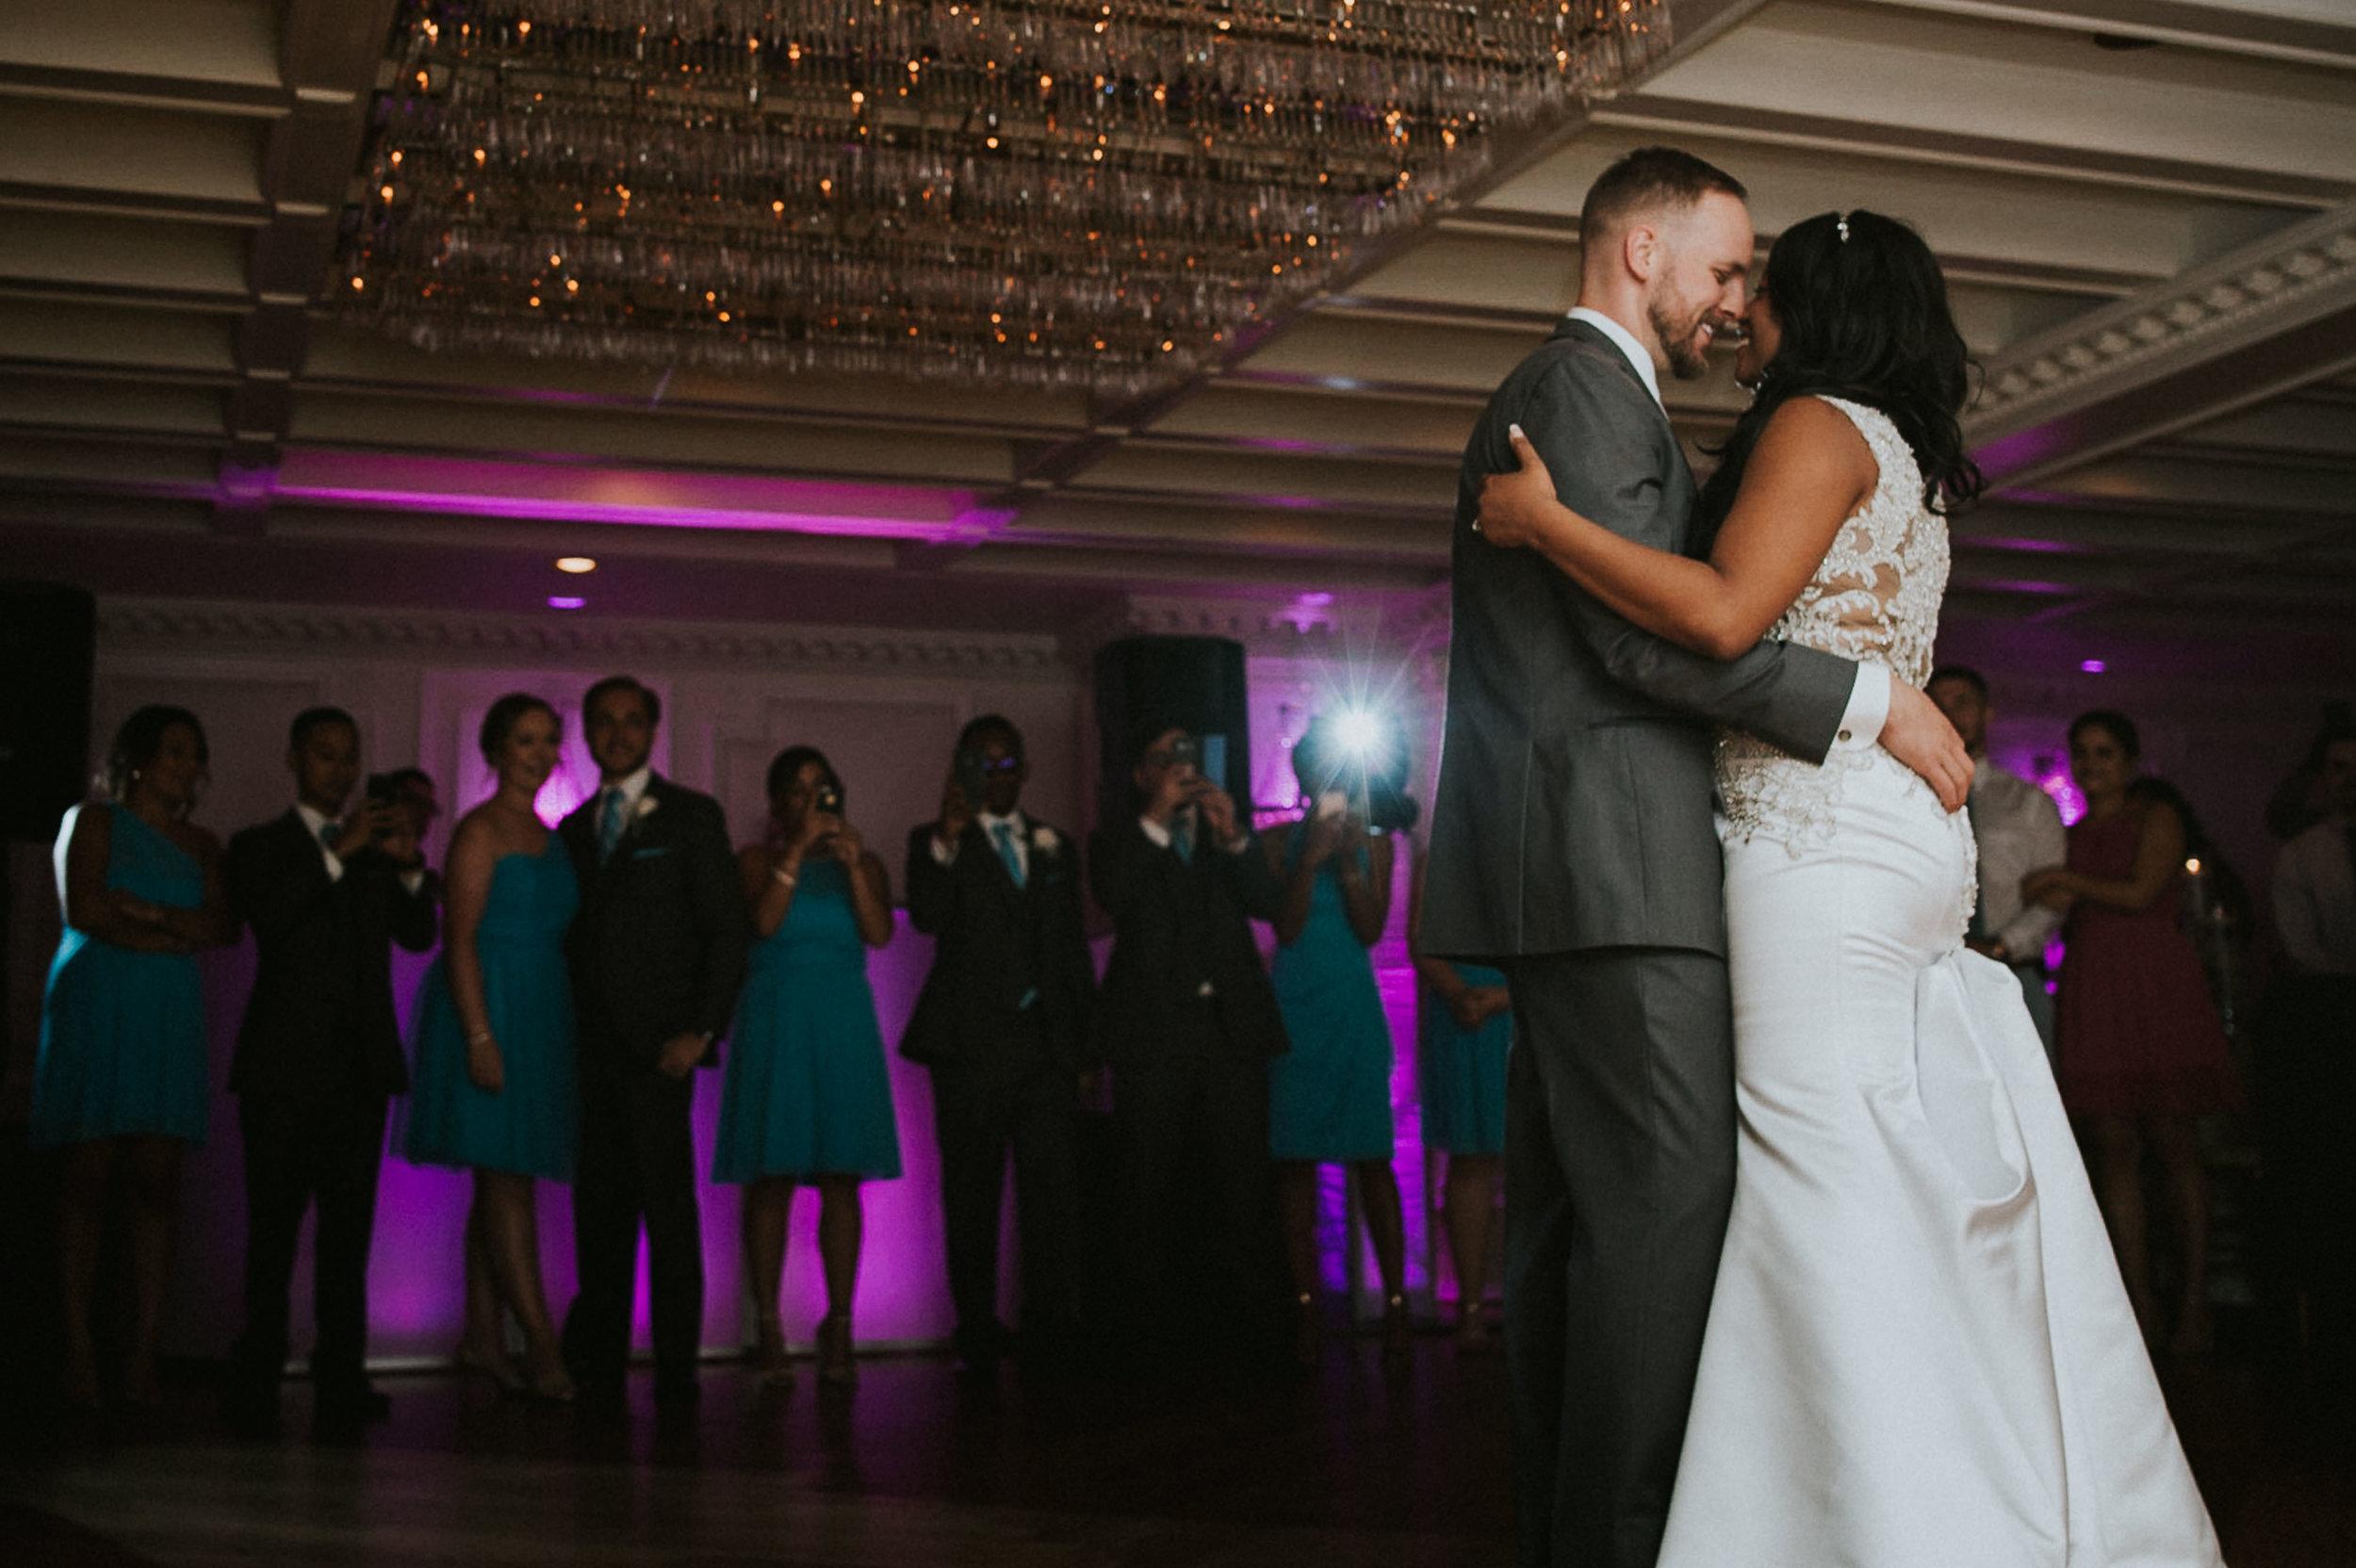 Tiana-and-Danny-Wedding-855.jpg